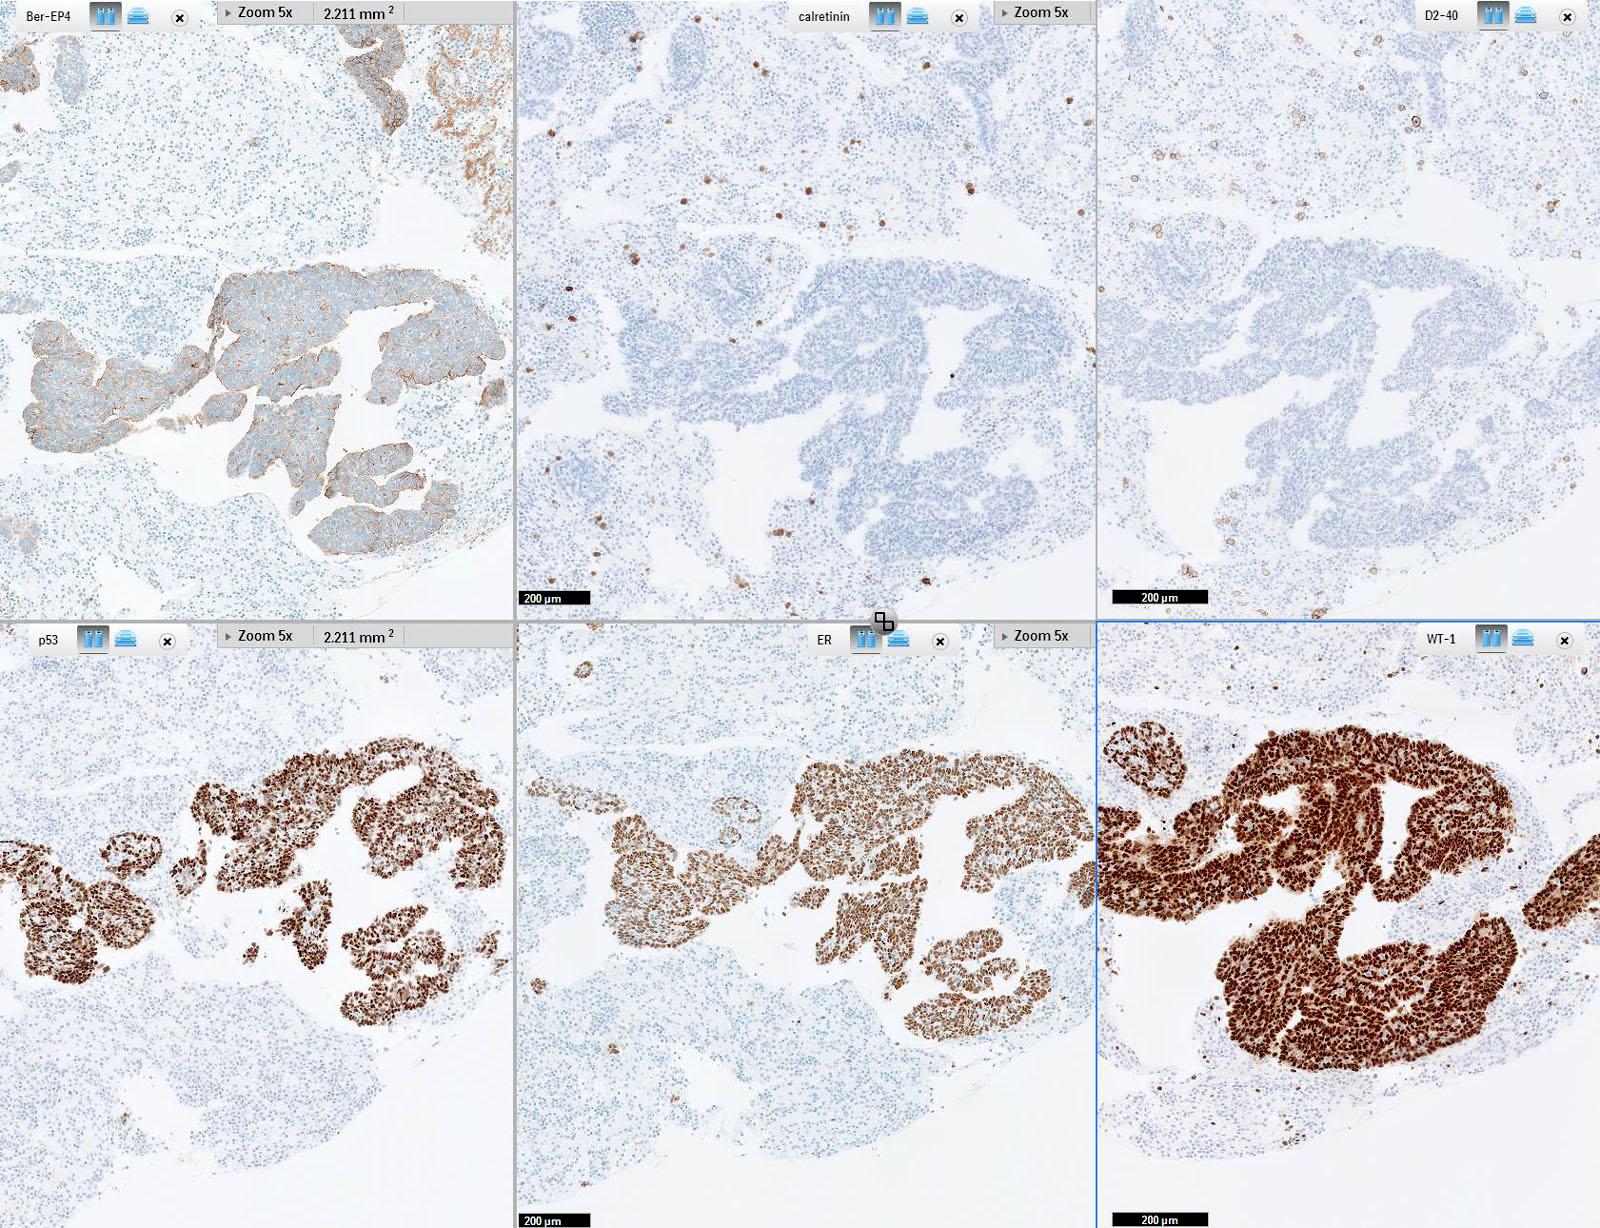 fordított urothelialis papilloma p53)